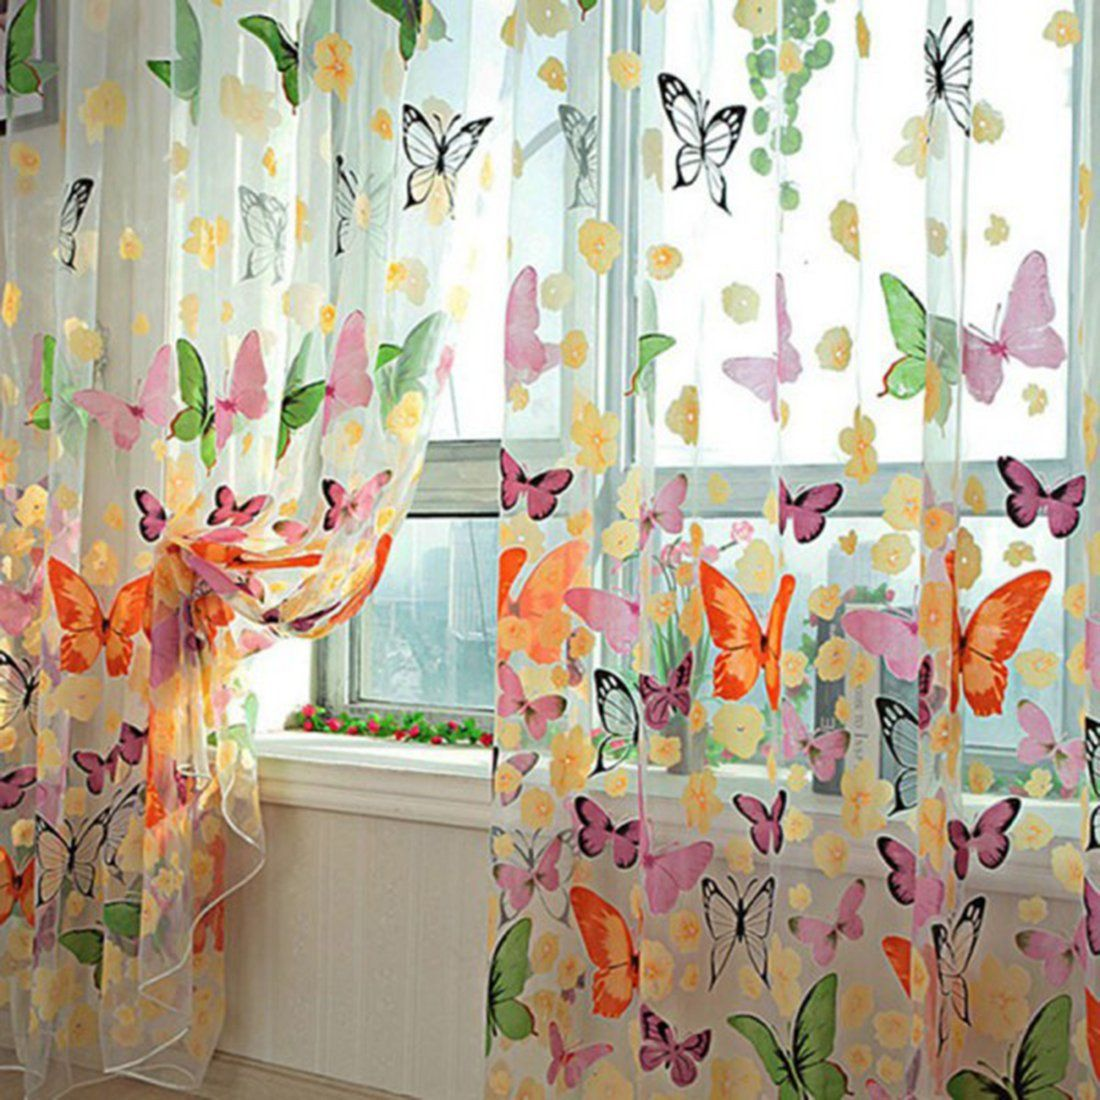 Hmane offset print window door curtains drapes panels sheer voile